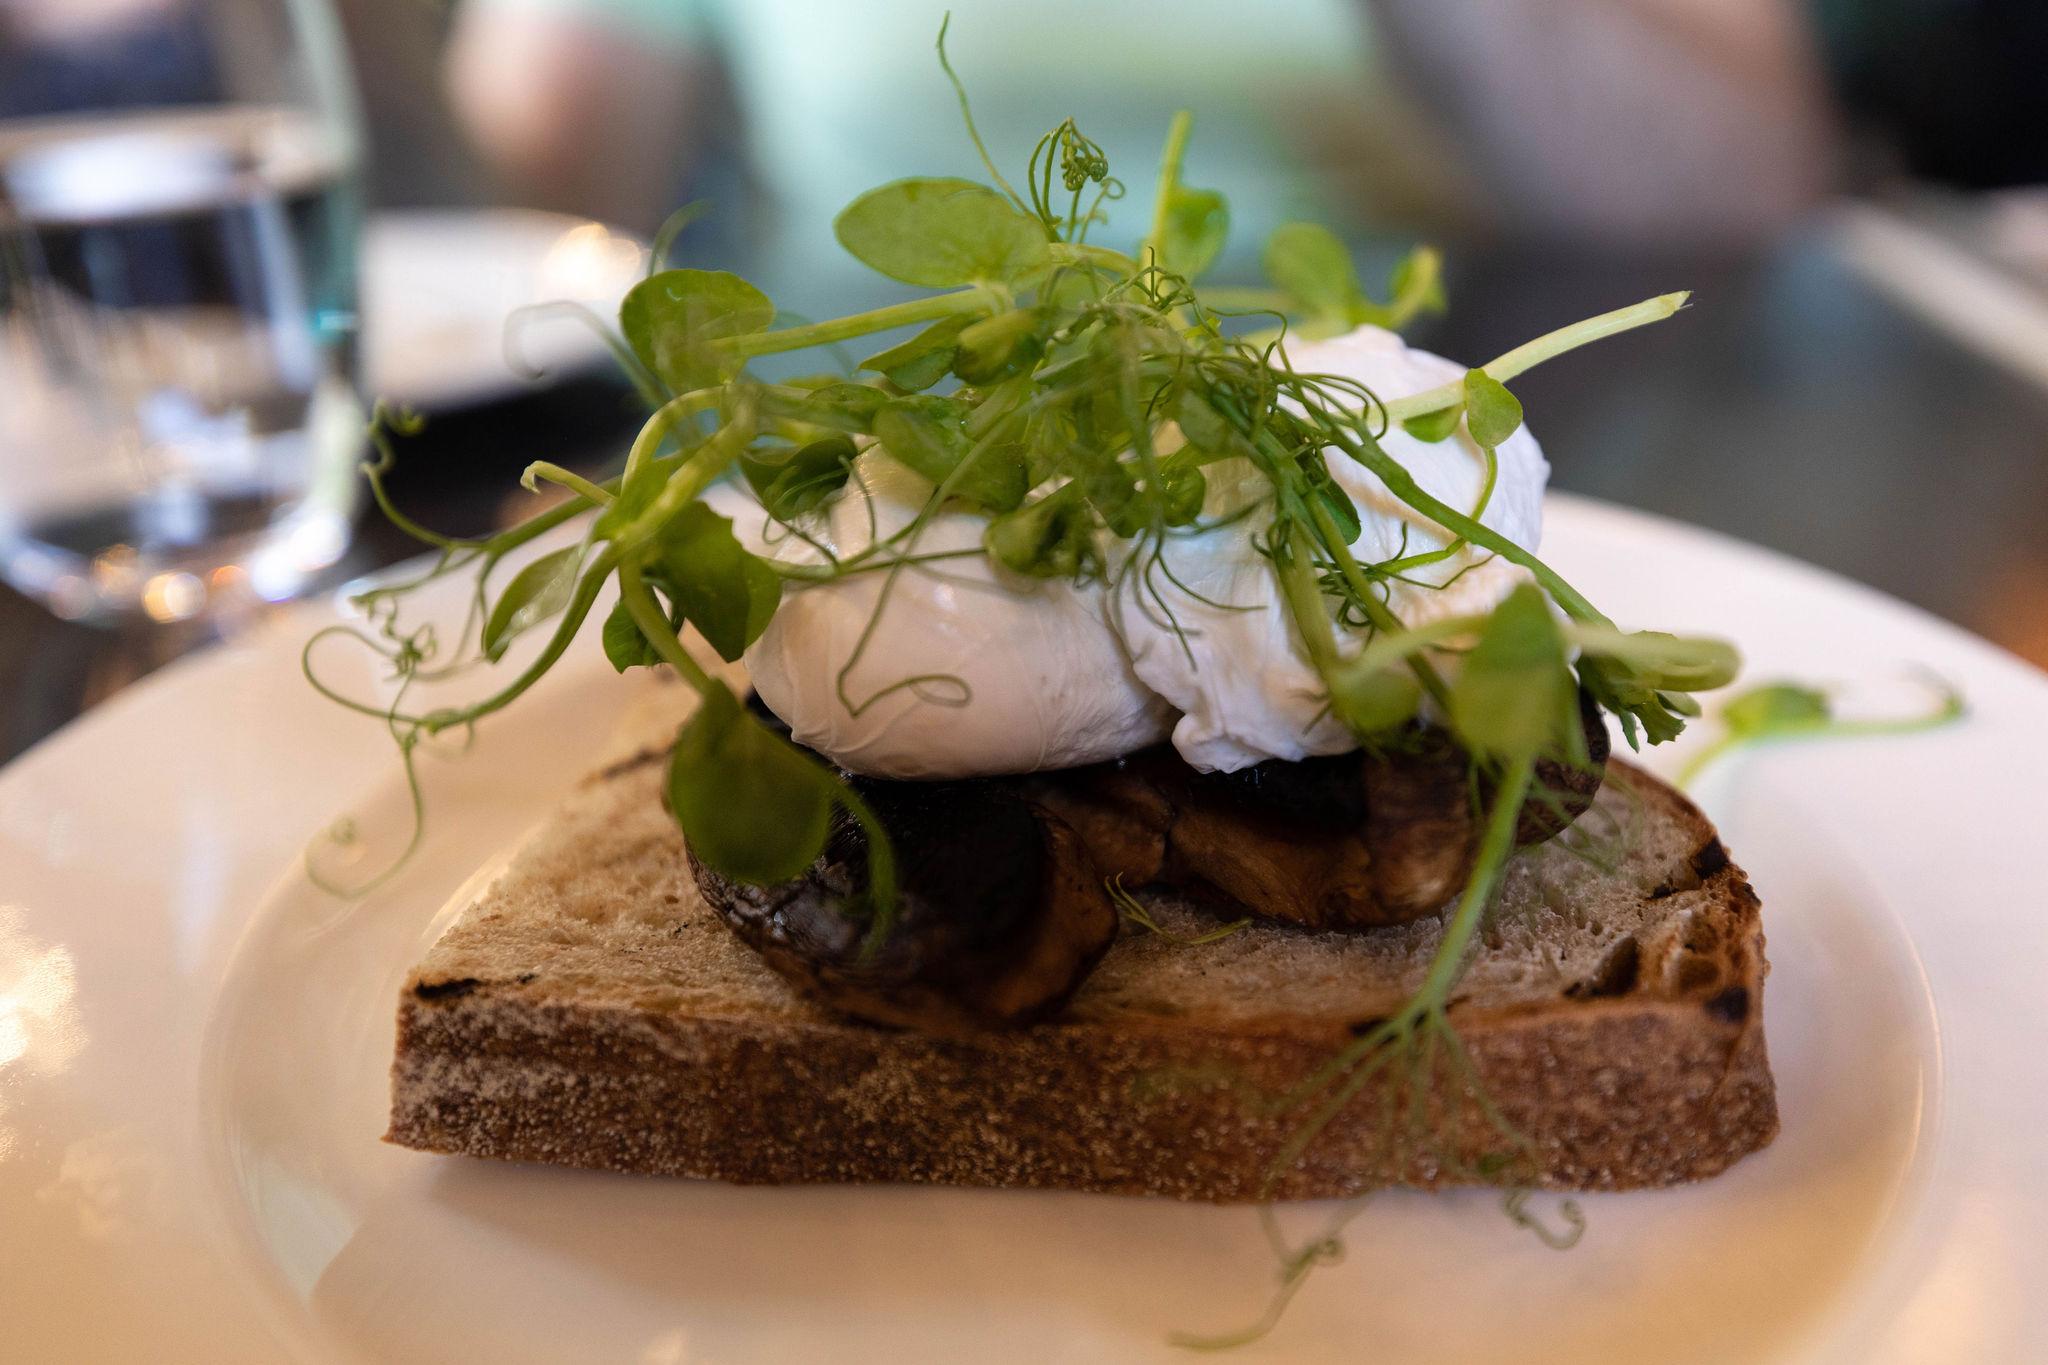 Review of Grand Café at The Scotsman Hotel Edinburgh